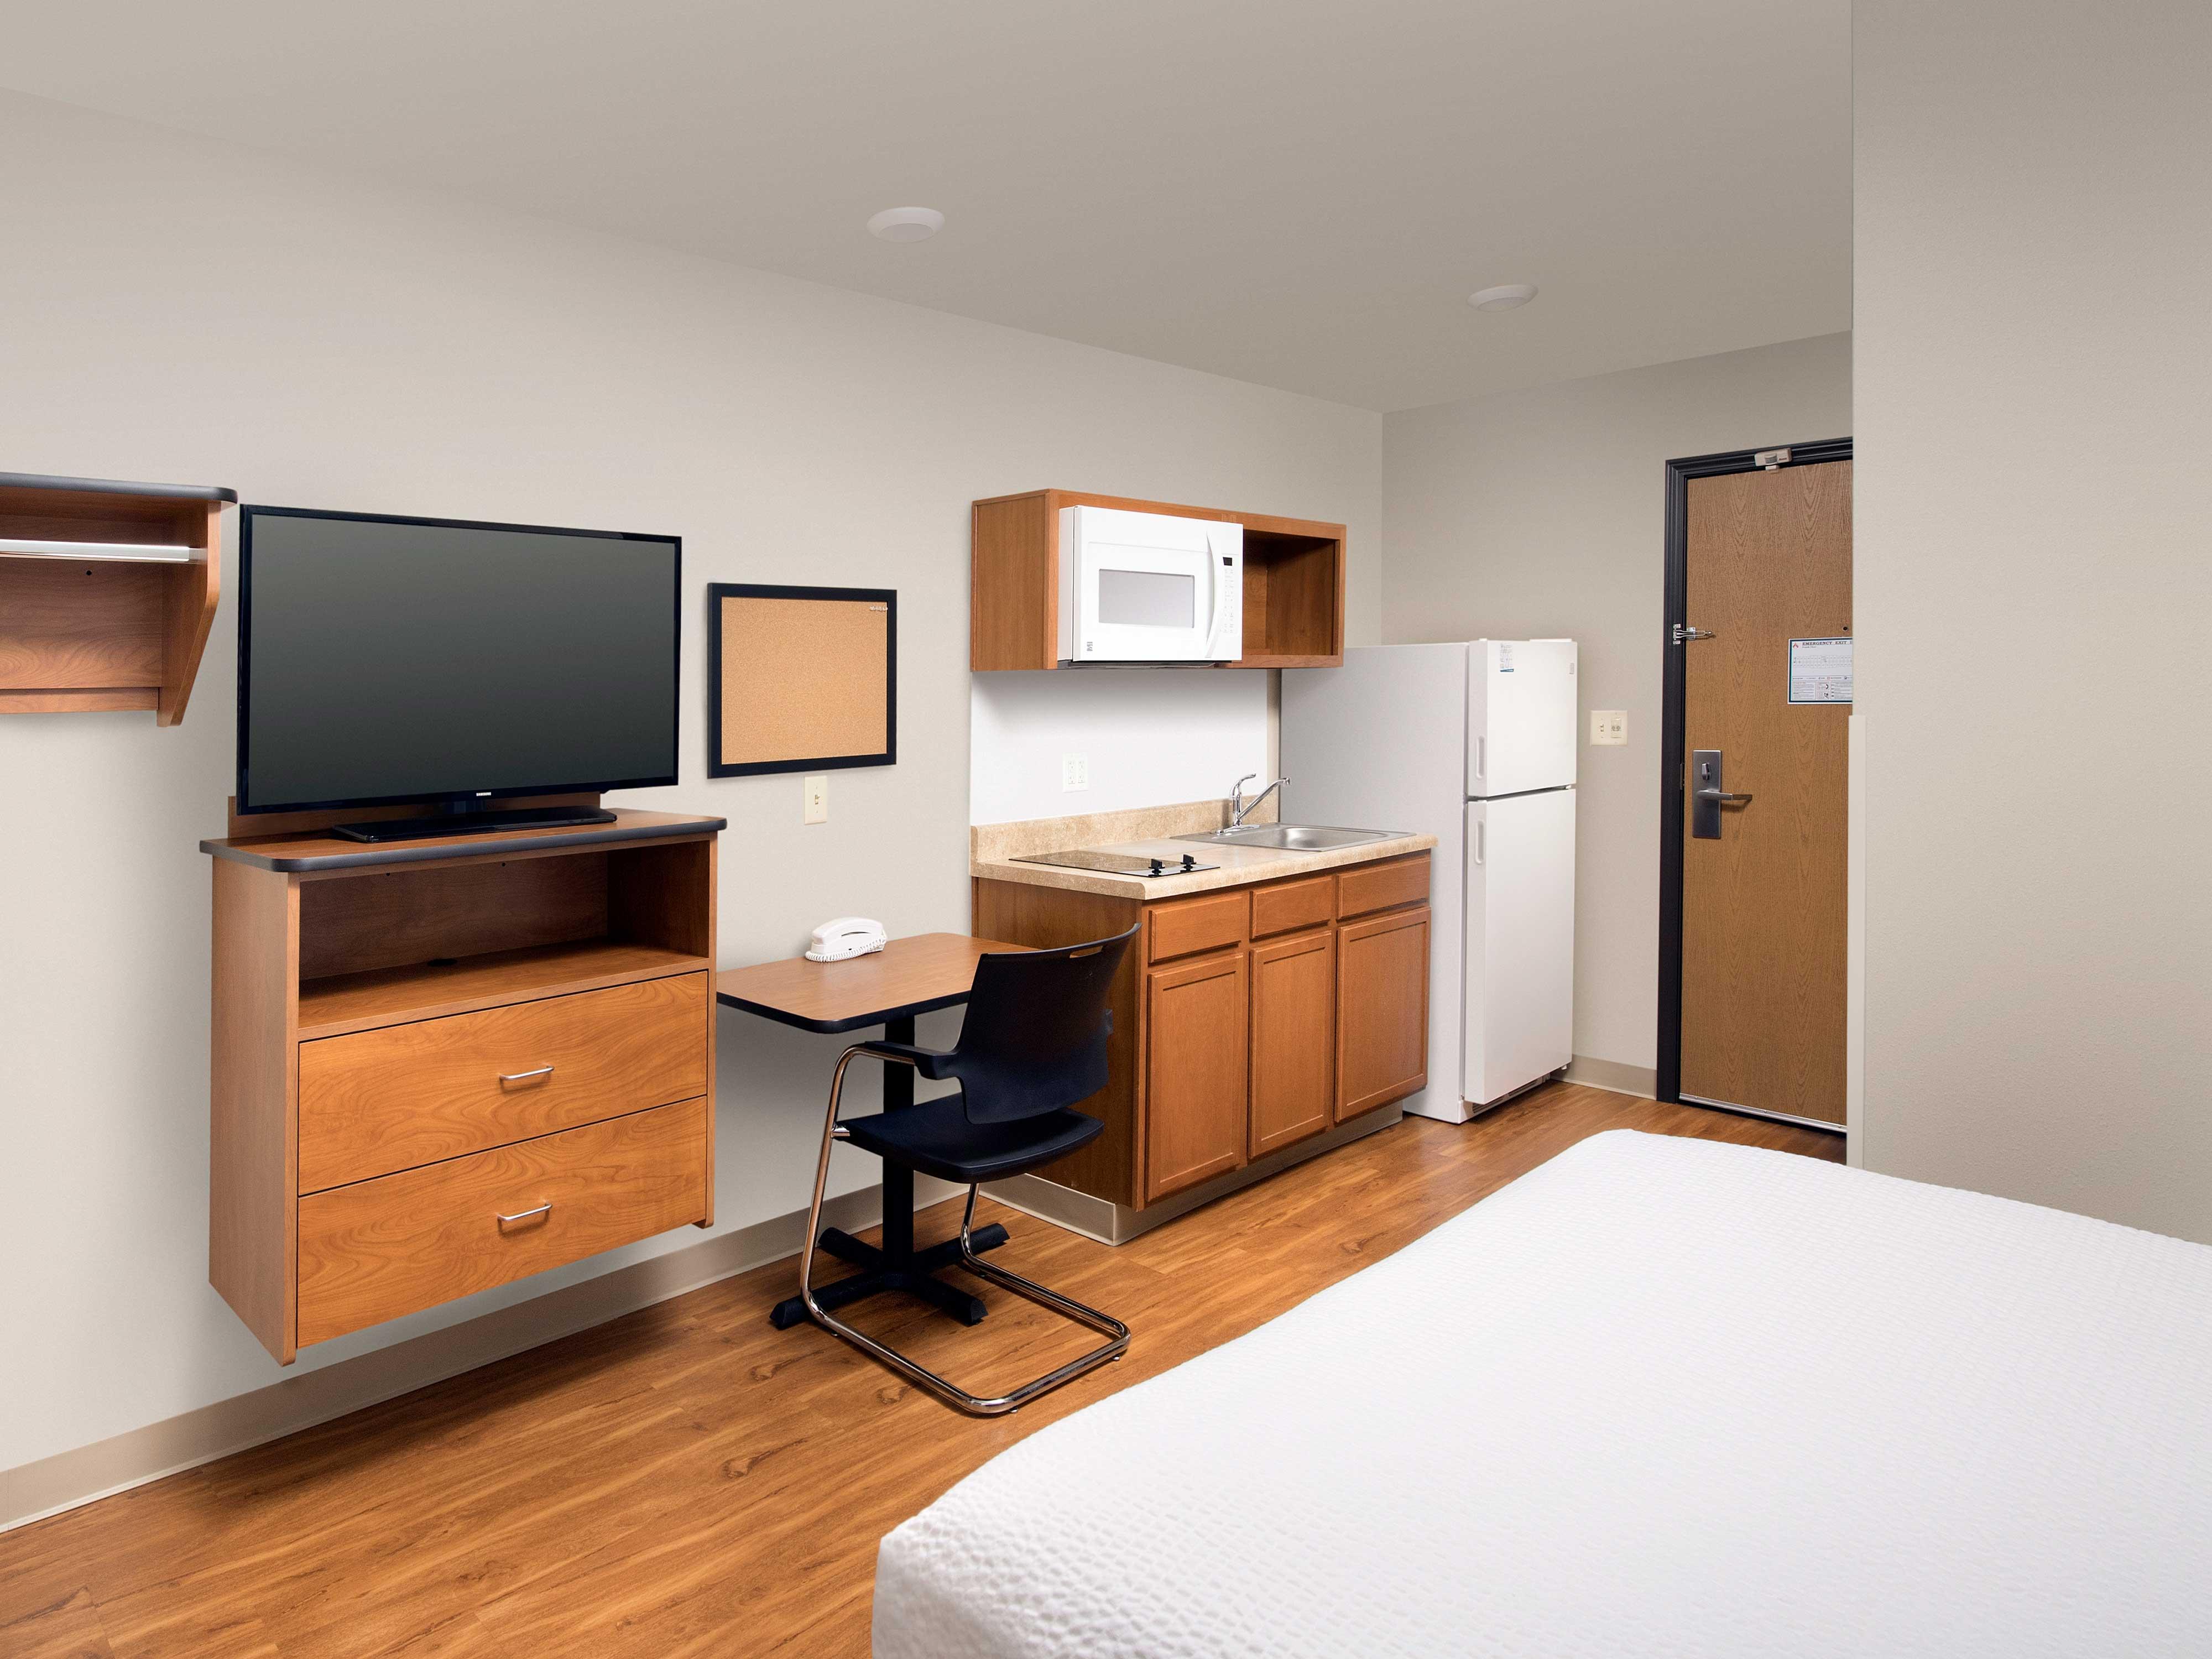 WoodSpring Suites Grand Rapids South image 13